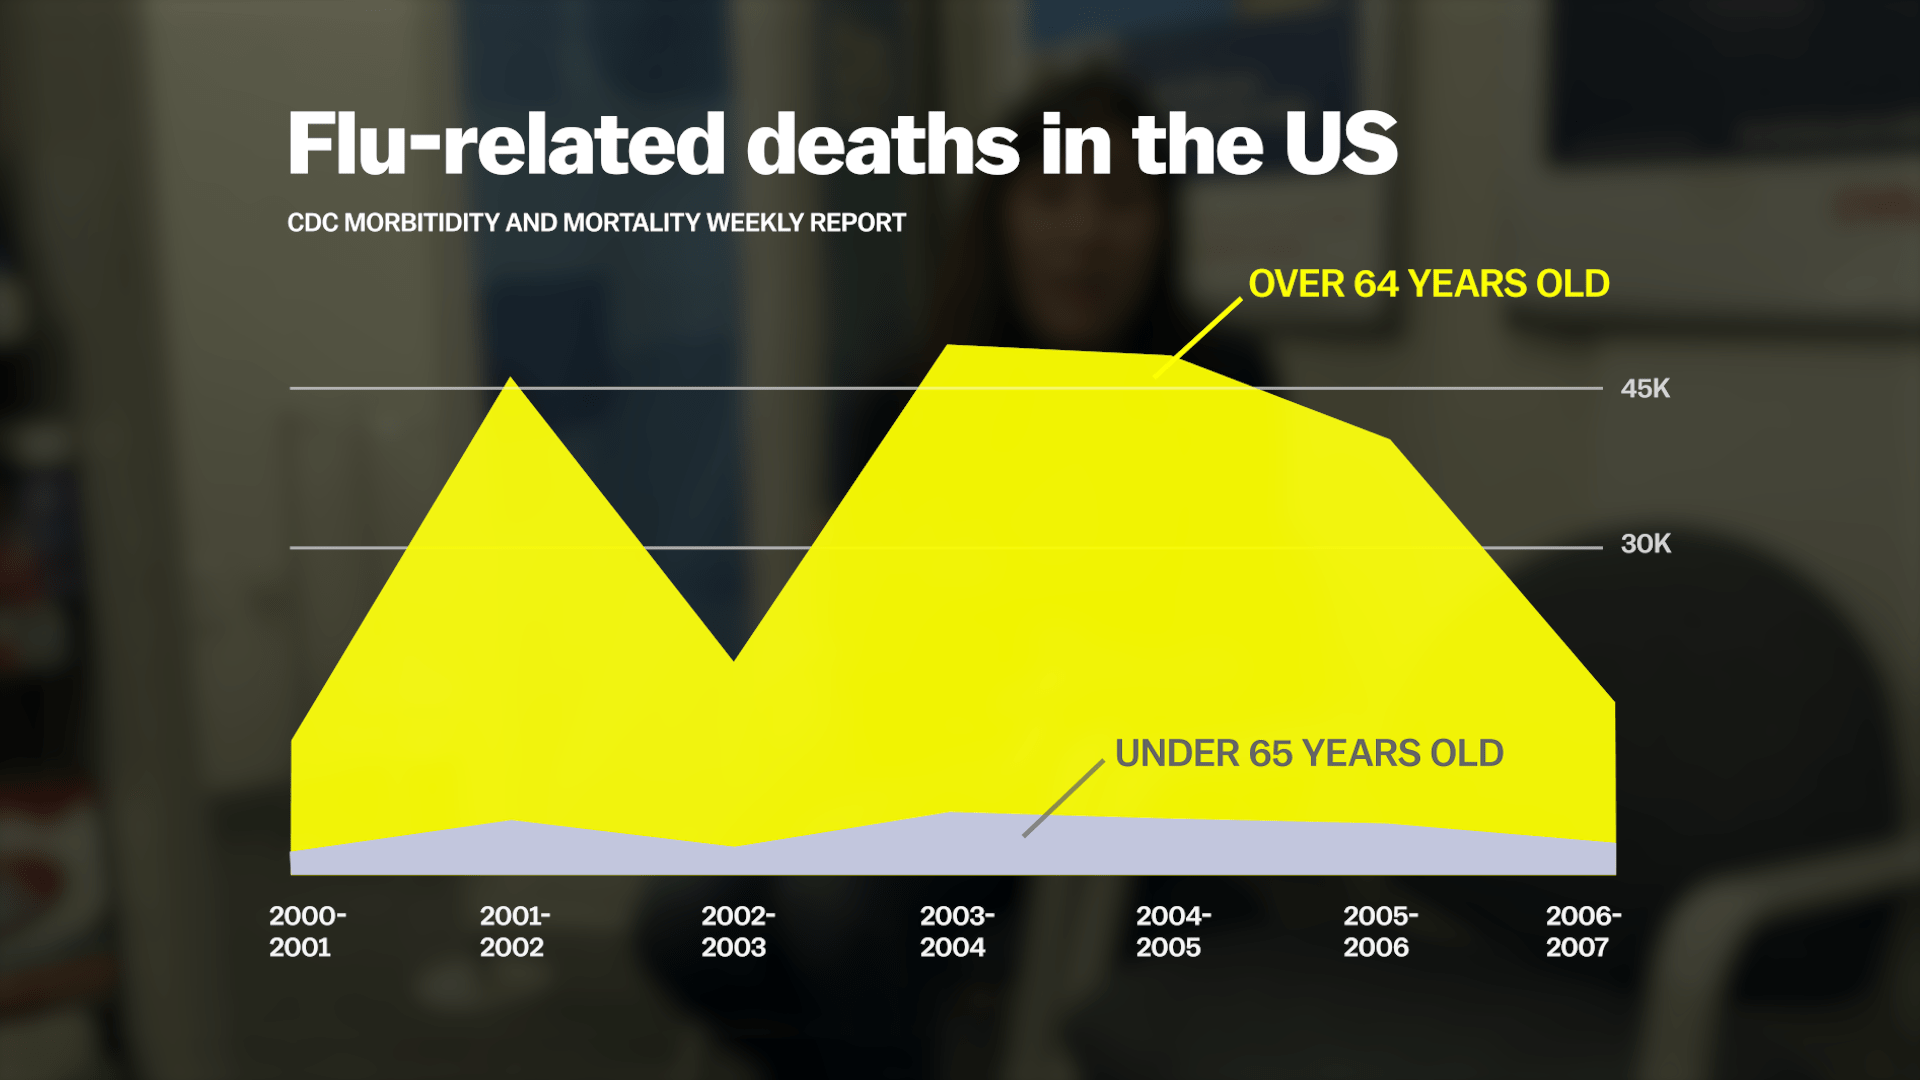 Flu-related deaths